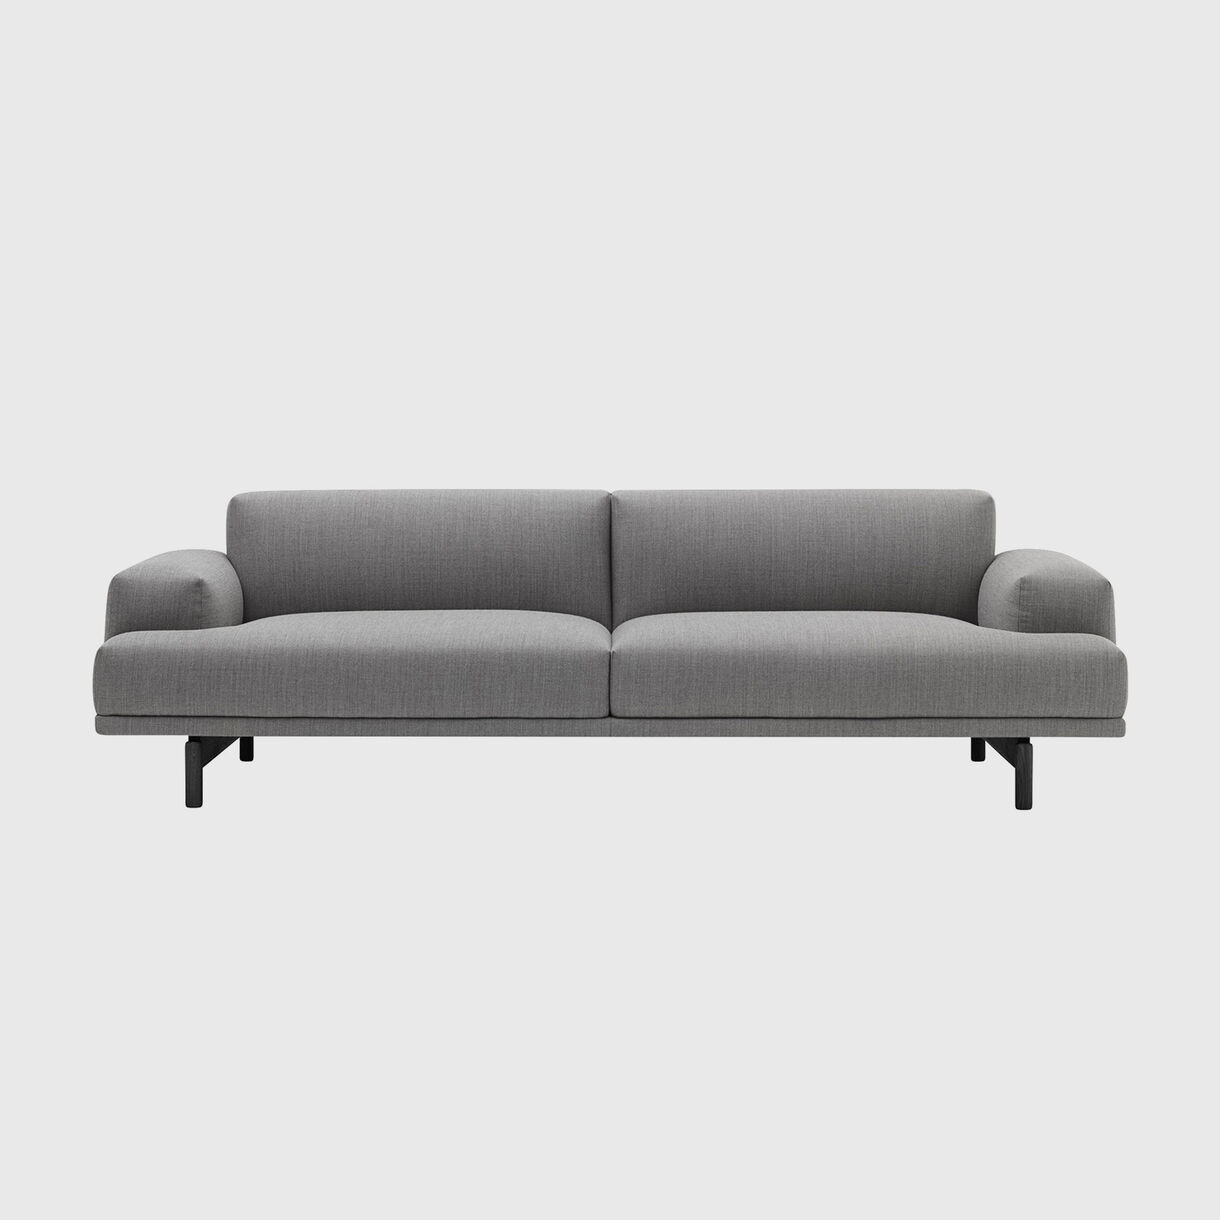 Compose Sofa, 3 Seater, Fiord 151